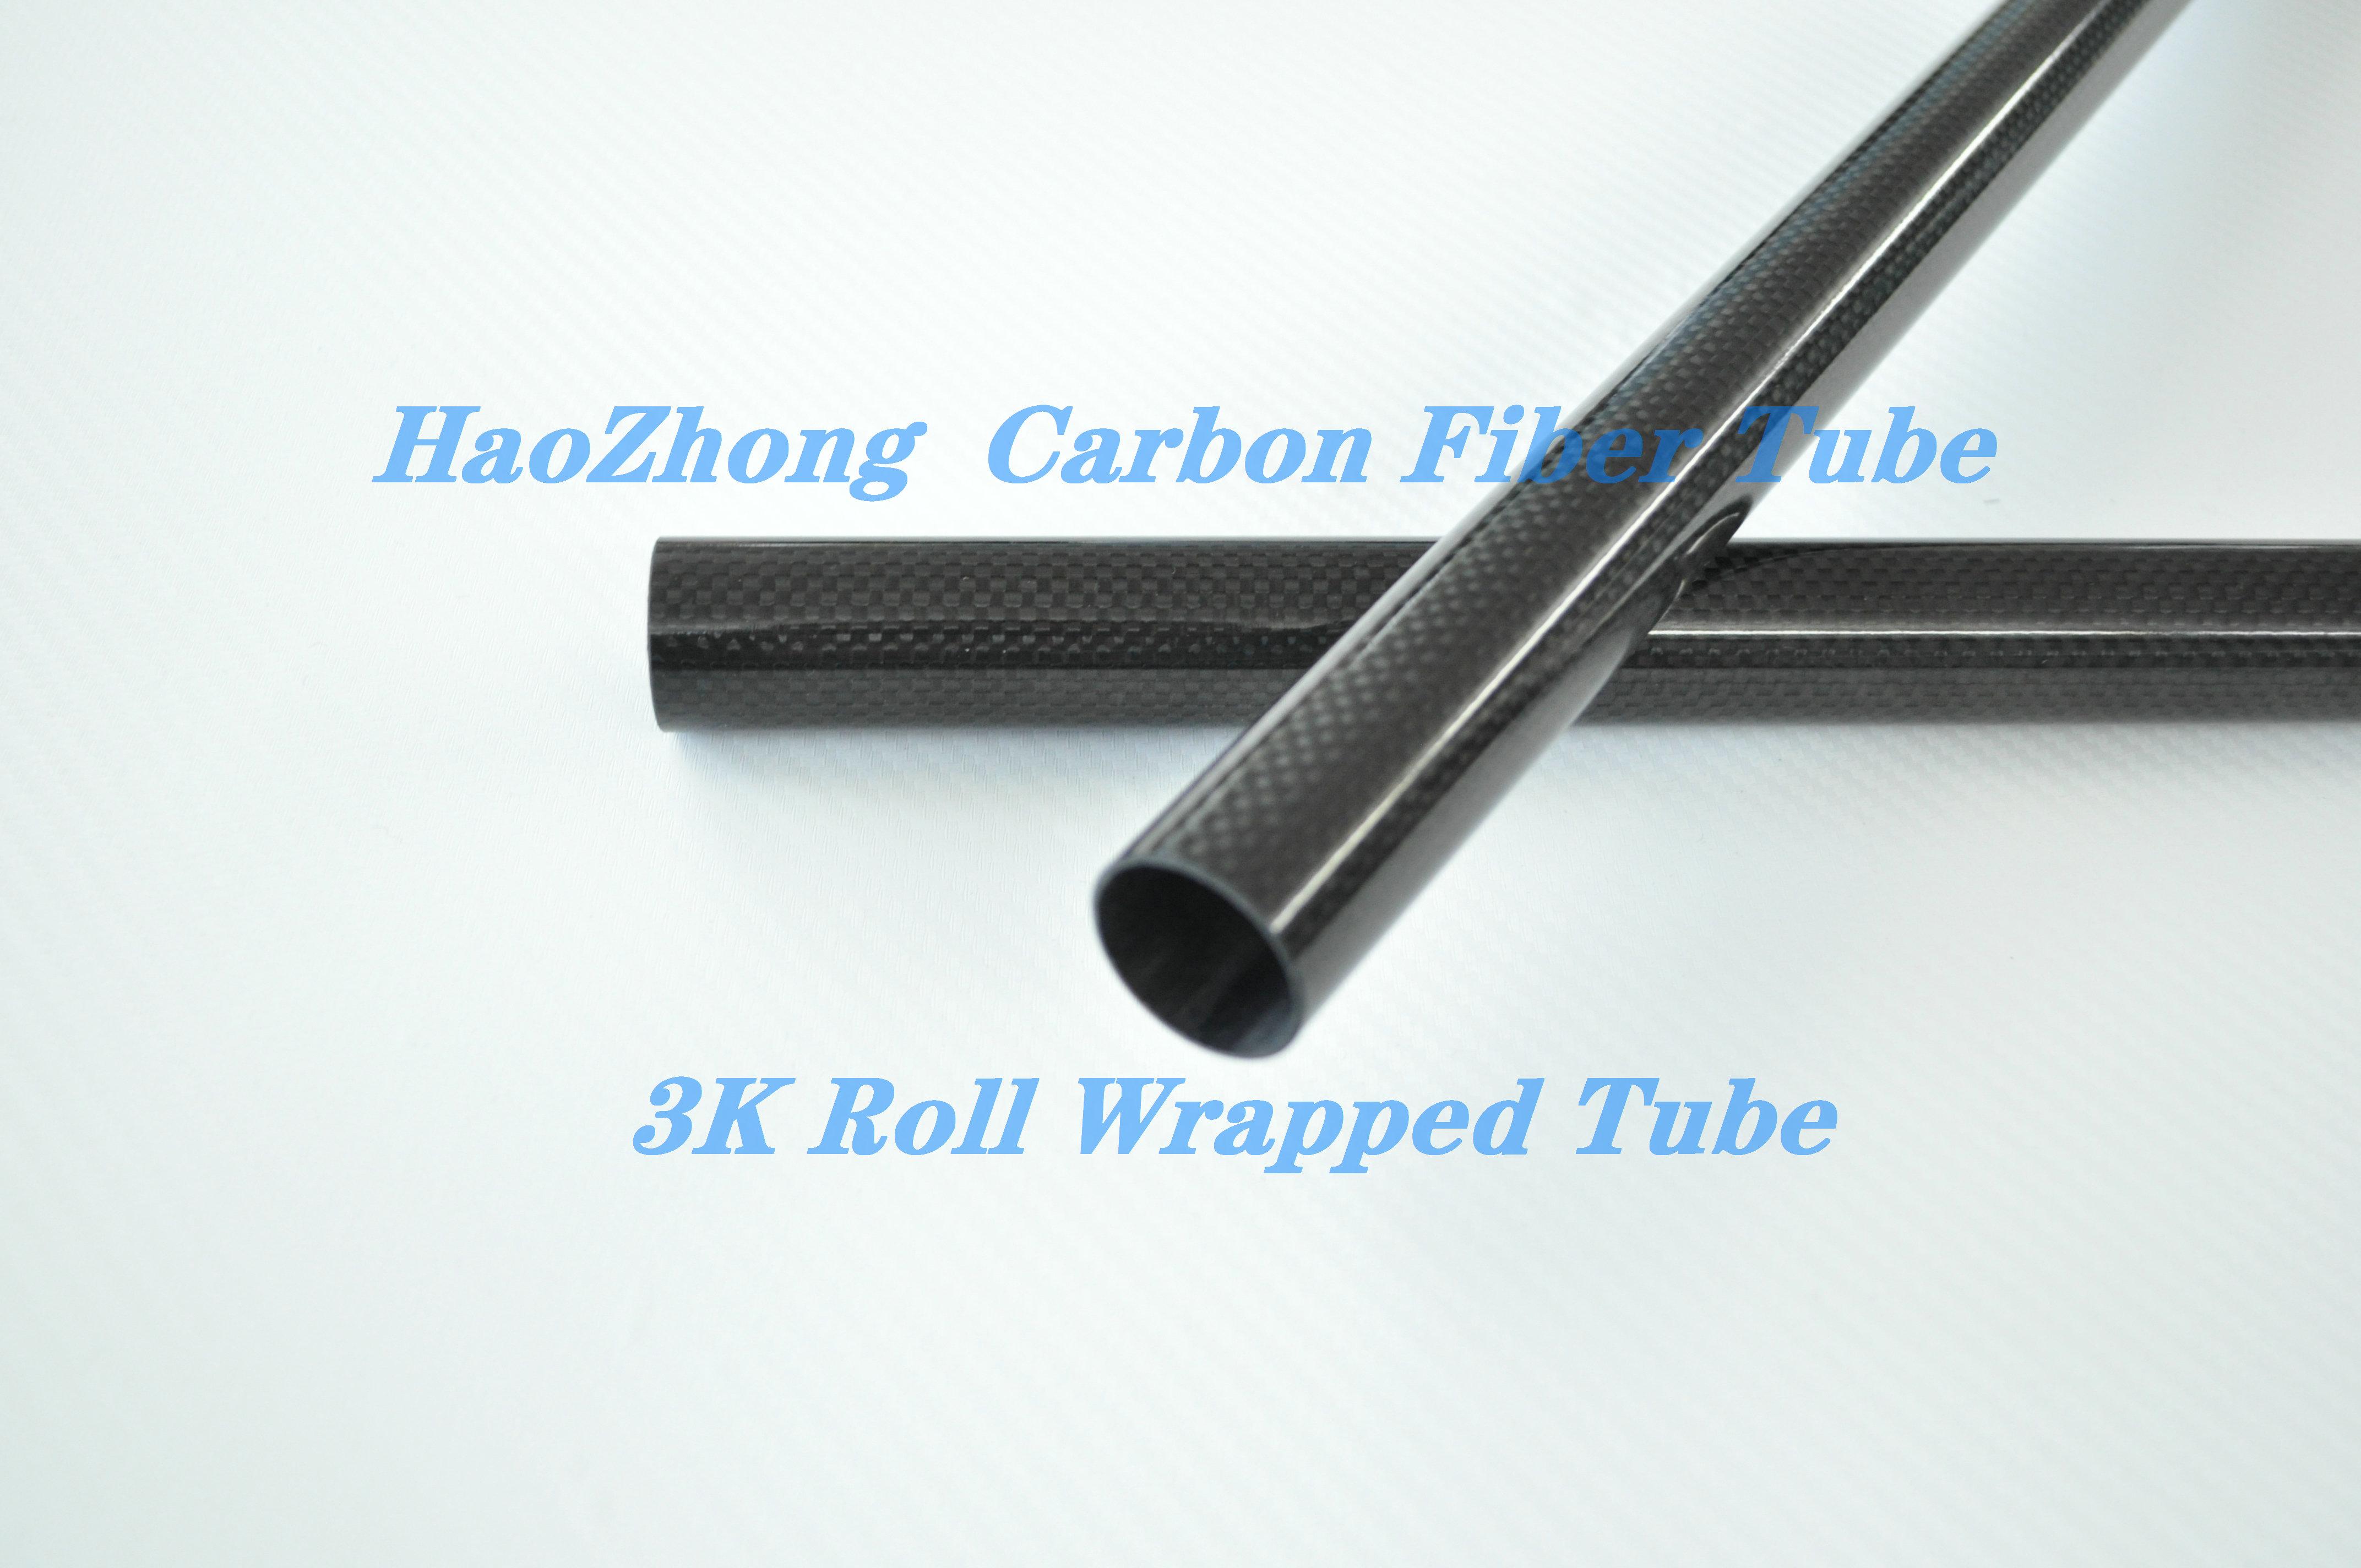 1PCS Carbon Fiber Tubes 8MM OD x 7MM ID x 1000MM 100% 3k Carbon Fiber tube / Tubing /pipe/shaft Roll Wrapped . 100% full carbon